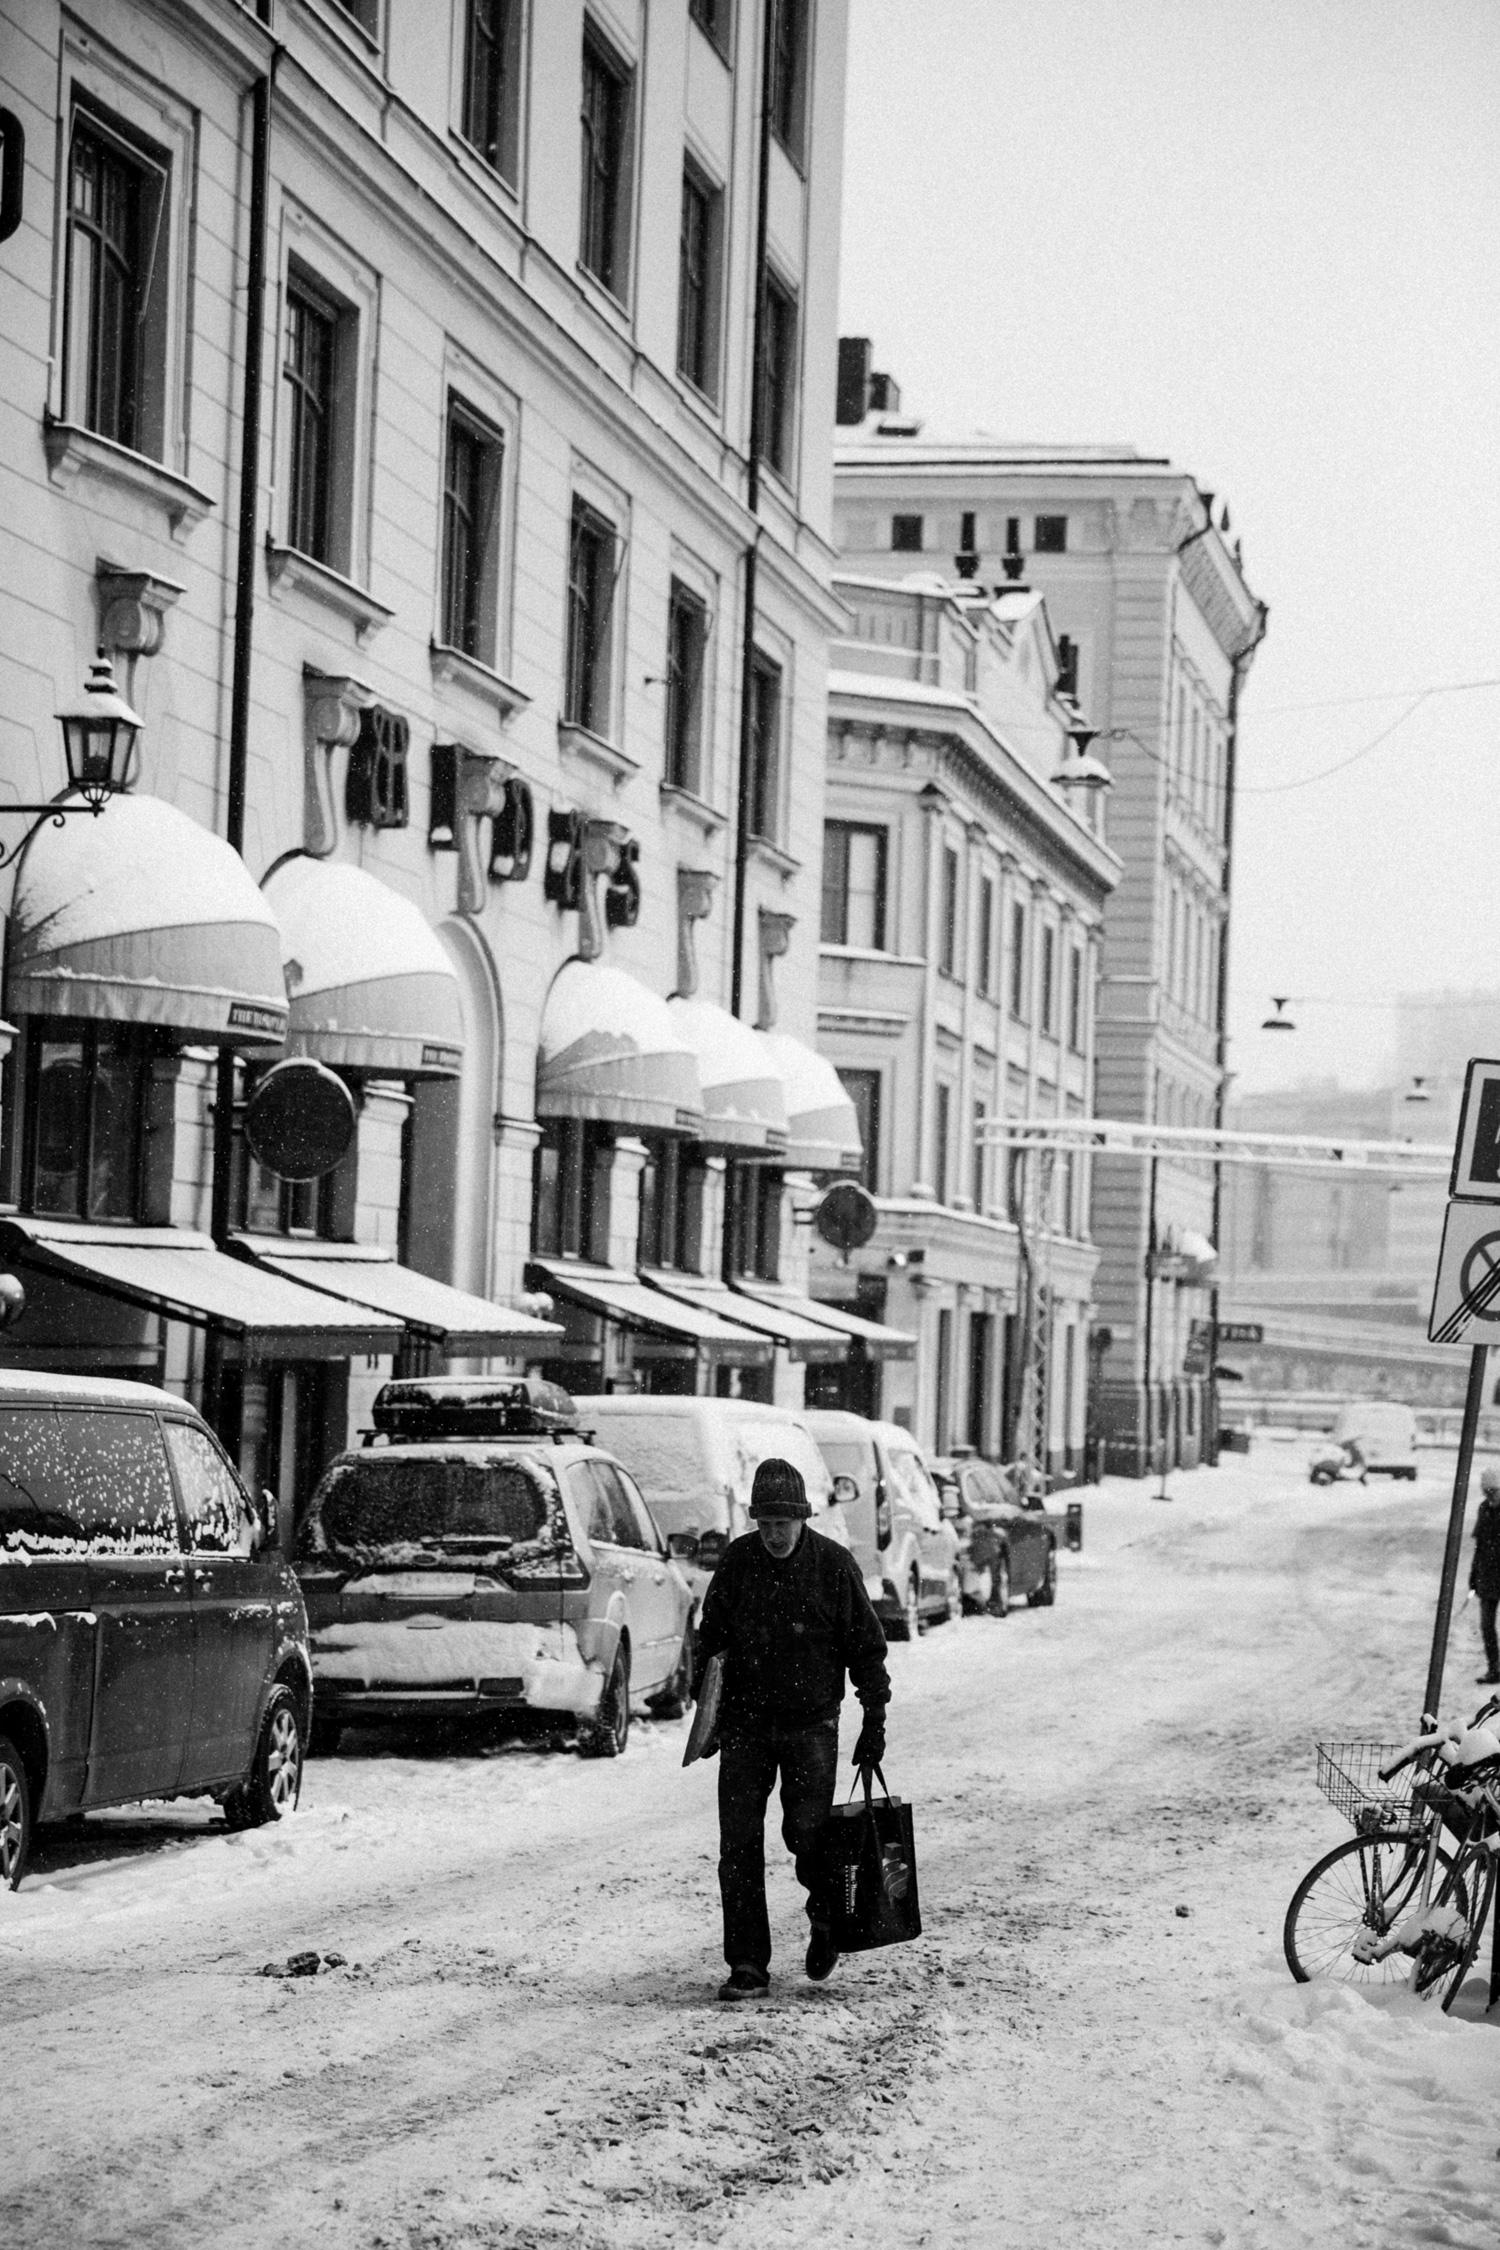 081-gamla-stan-old-town.jpg